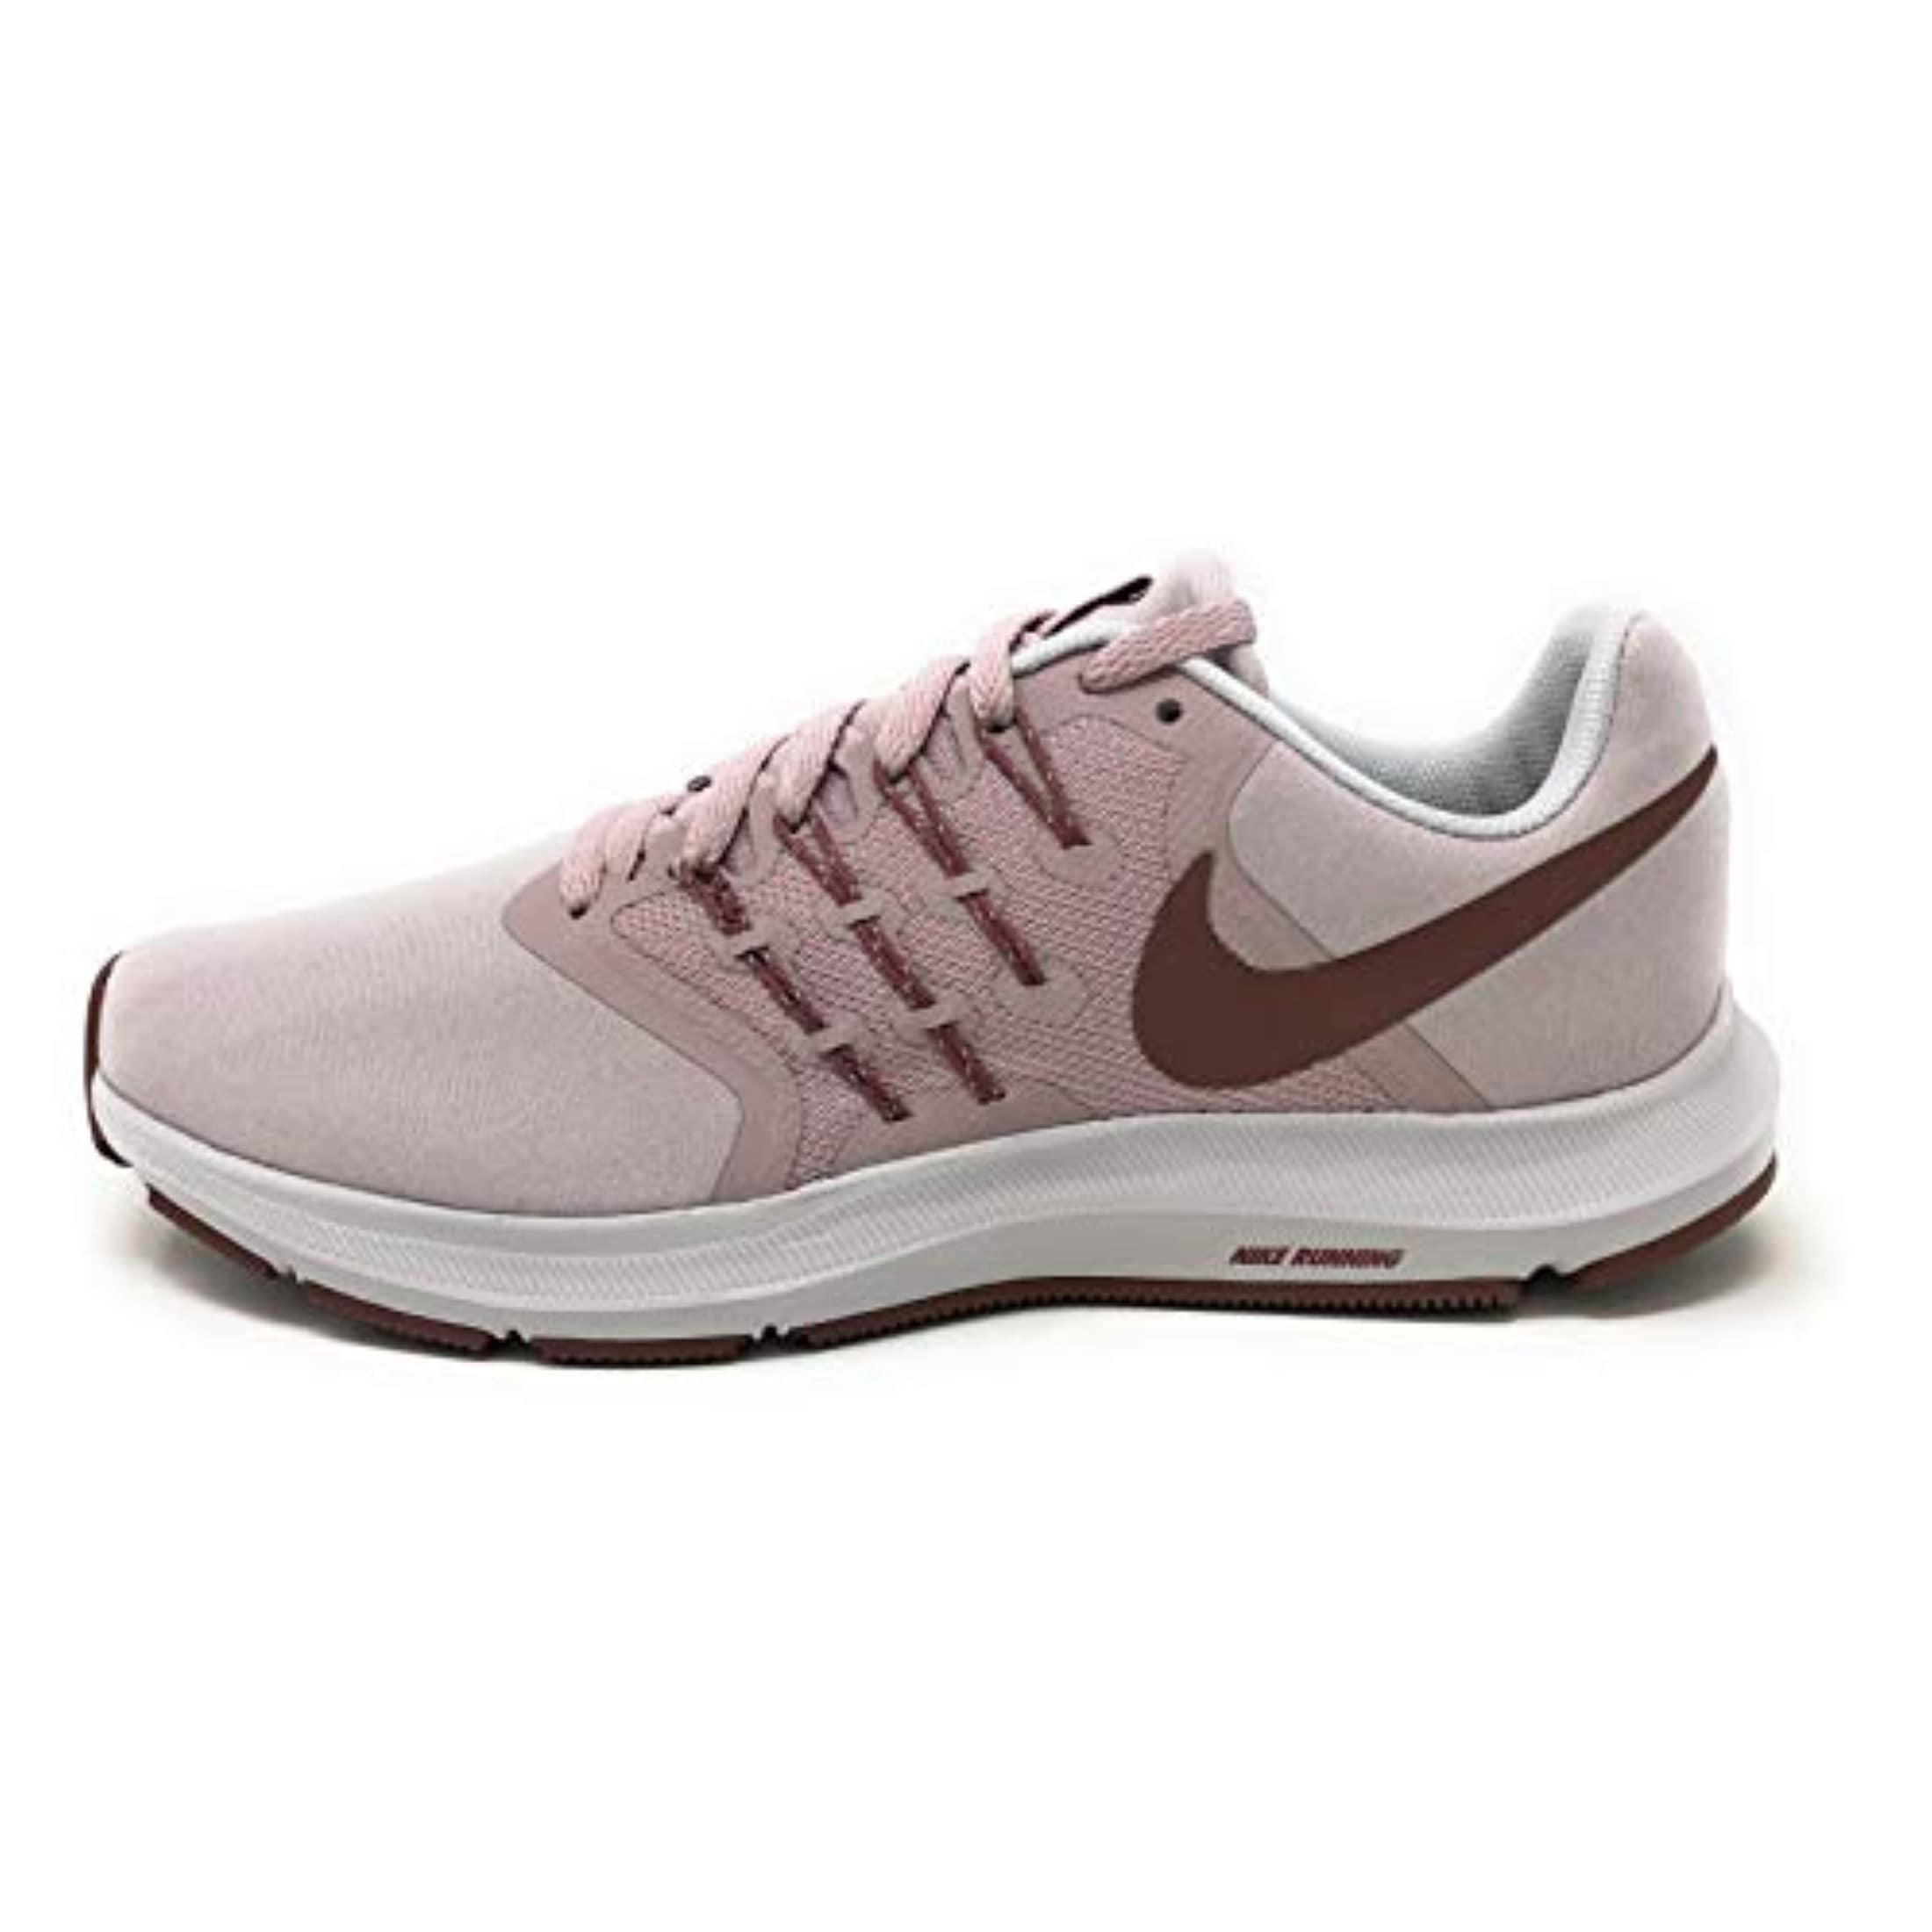 8daed58d1a9a2 Shop Nike Women s Run Swift Running Shoe